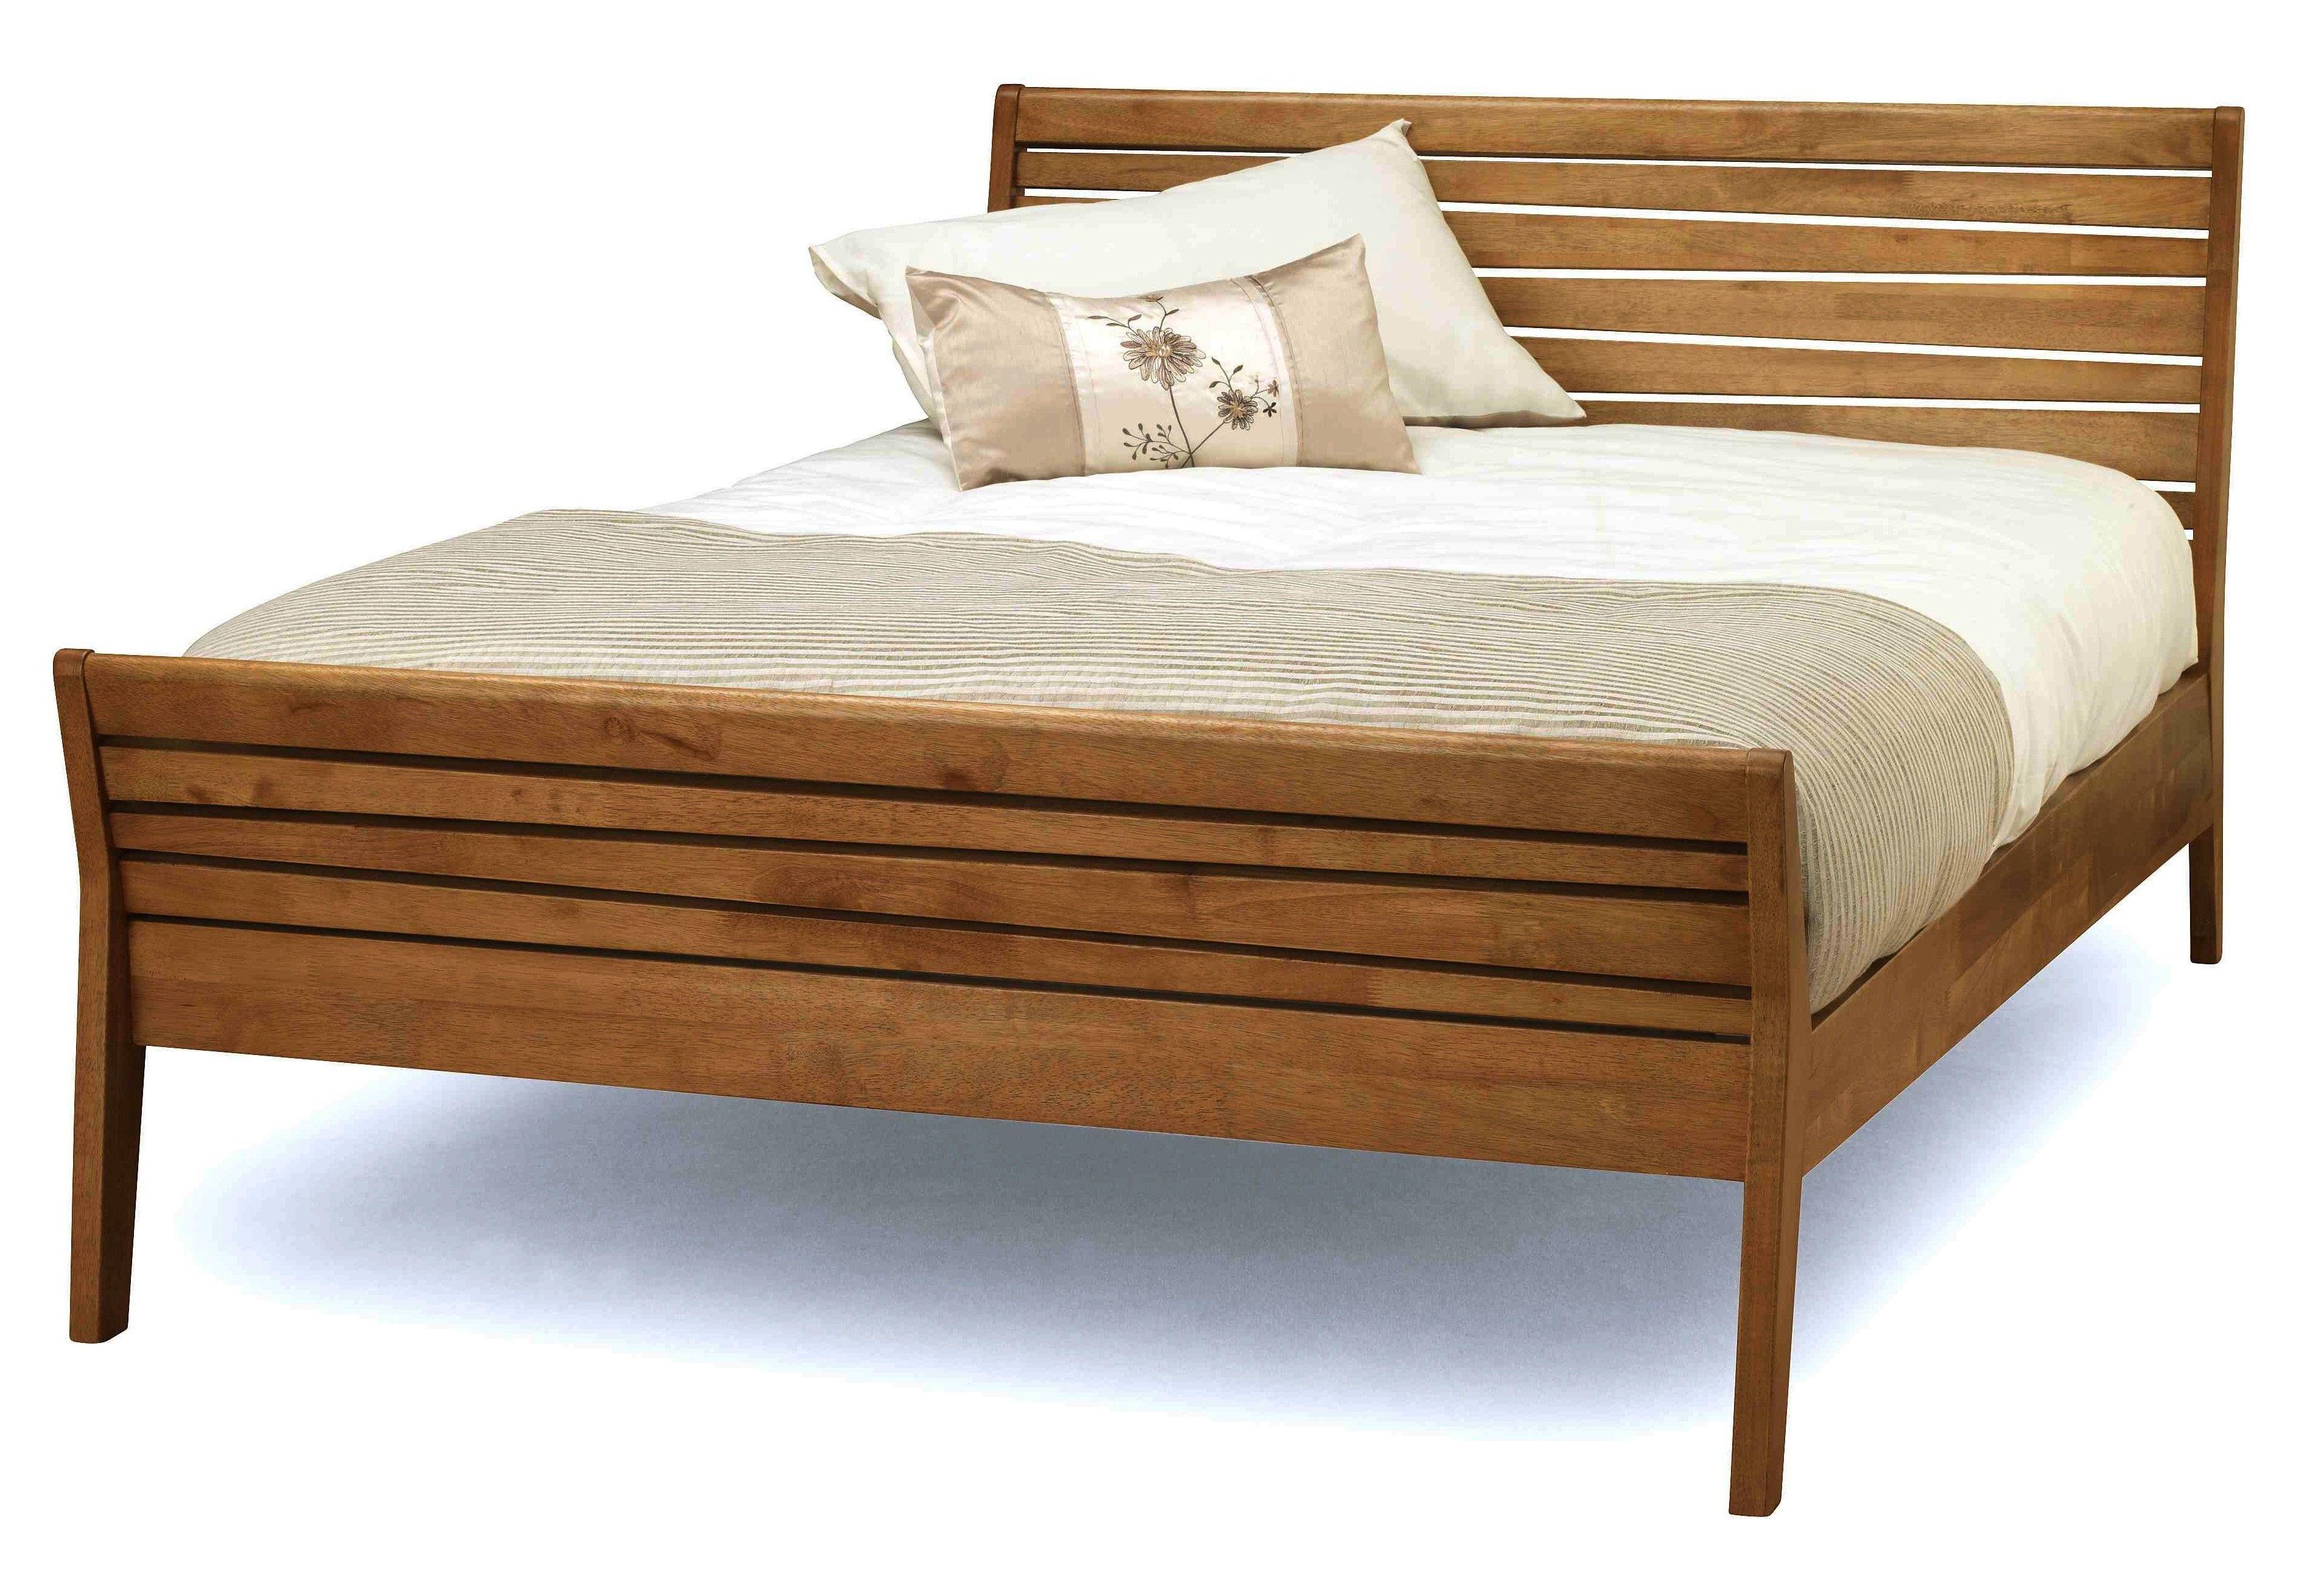 wooden bed frames zahra 46 double honey oak wooden - Double Bed Frames